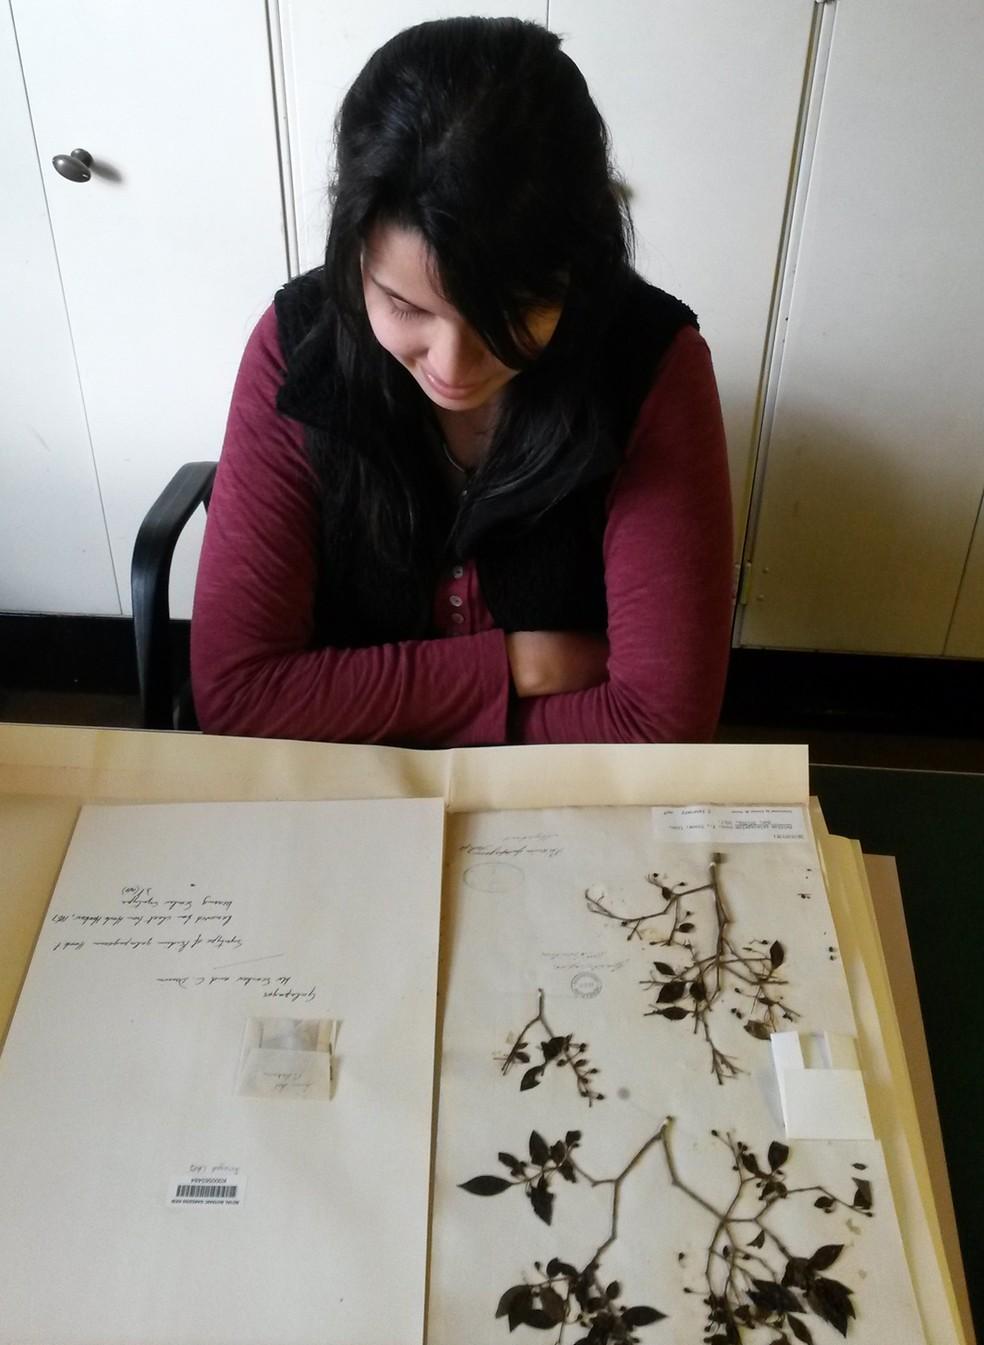 Bióloga mostra espécies catalogadas (Foto: Thaís Vasconcelos/Arquivo Pessoal)